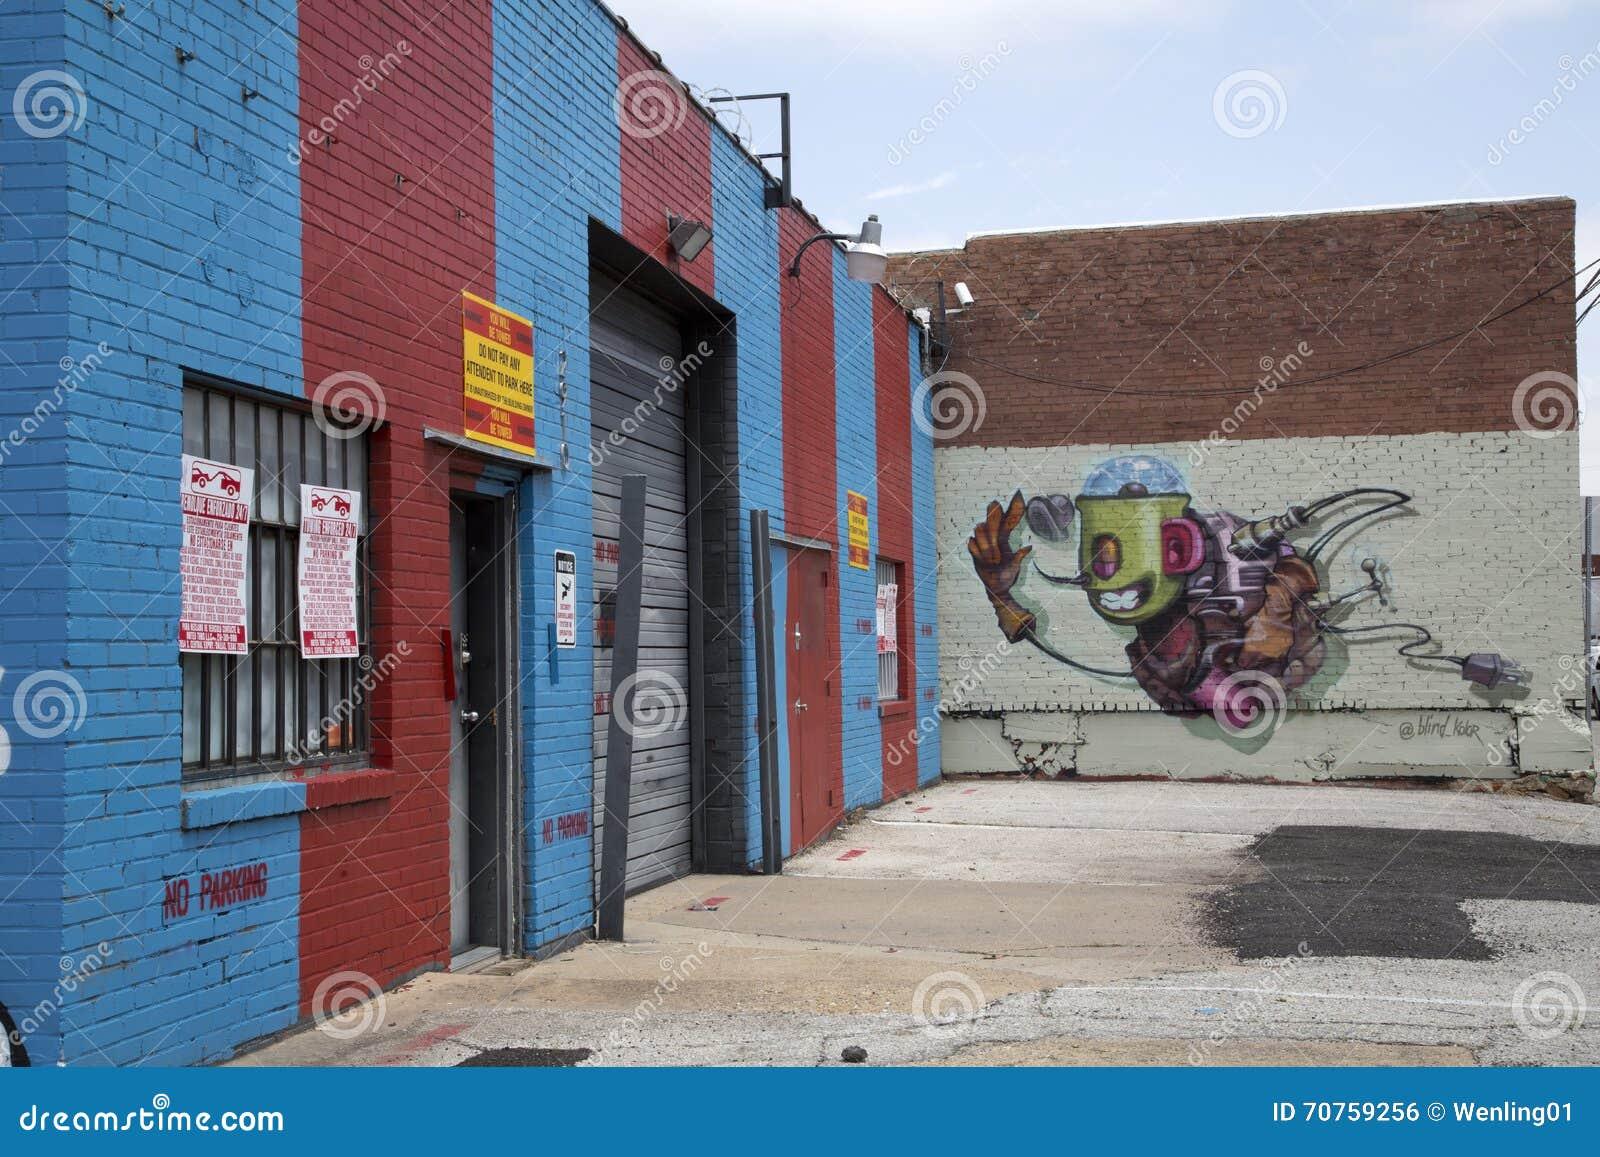 Graffiti wall dallas - Graffiti On The Wall Of Buildings Editorial Photo